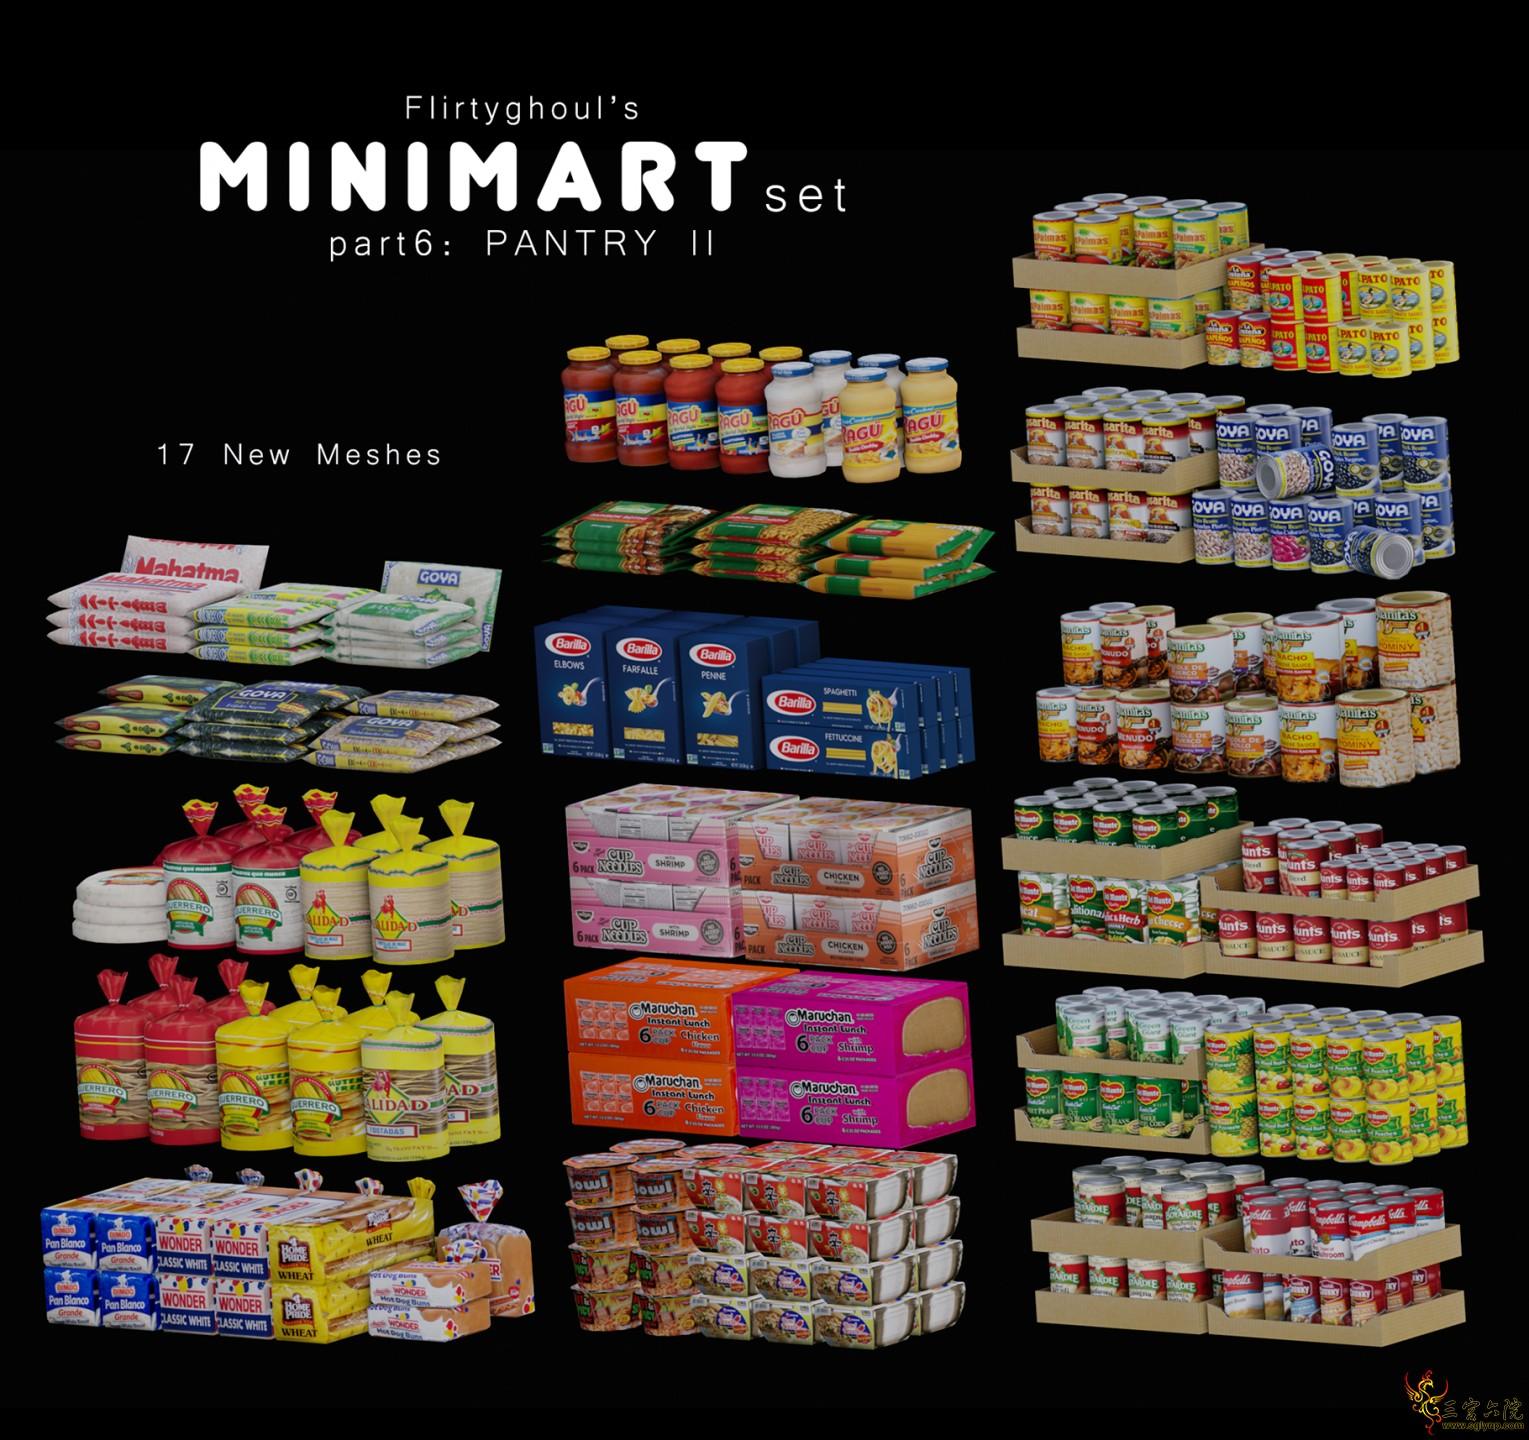 FG_Minimart_PART6_PANTRY2SET_prev2.png